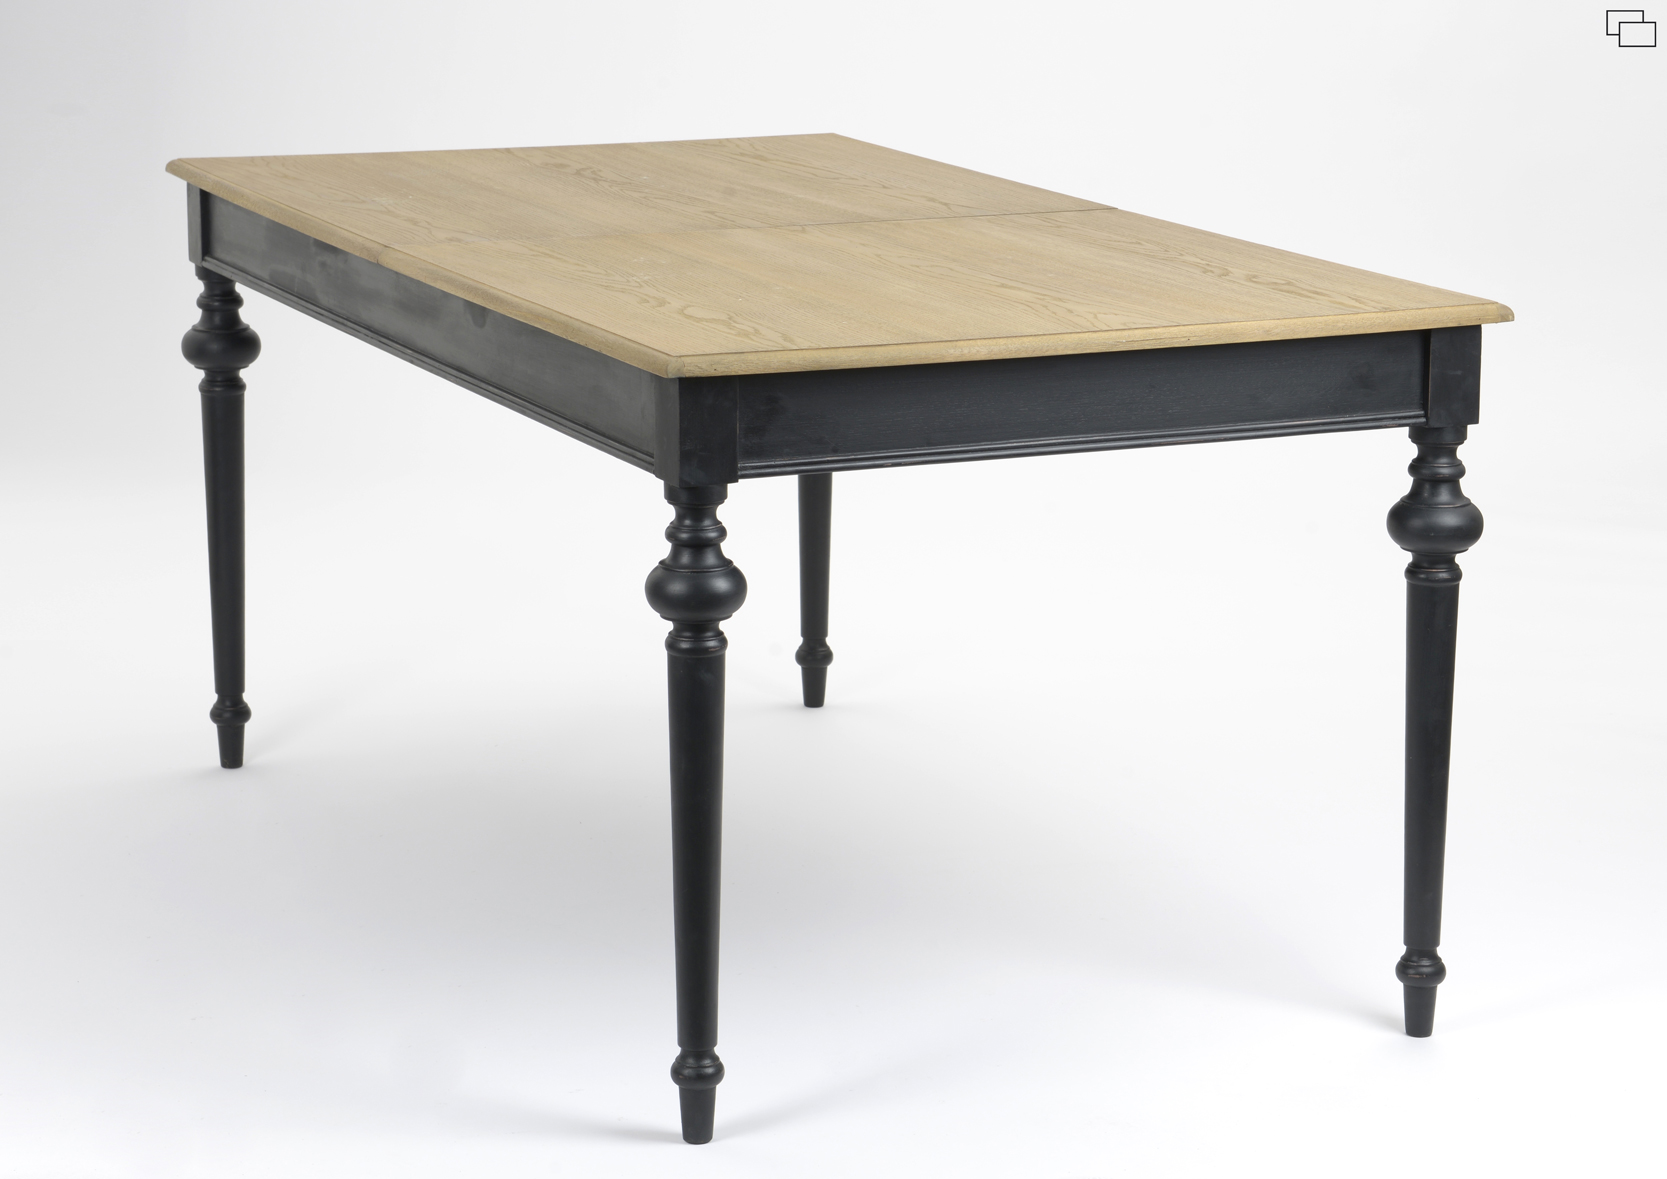 Table manger new l gende amadeus 107982 magasin de for Amadeus decoration